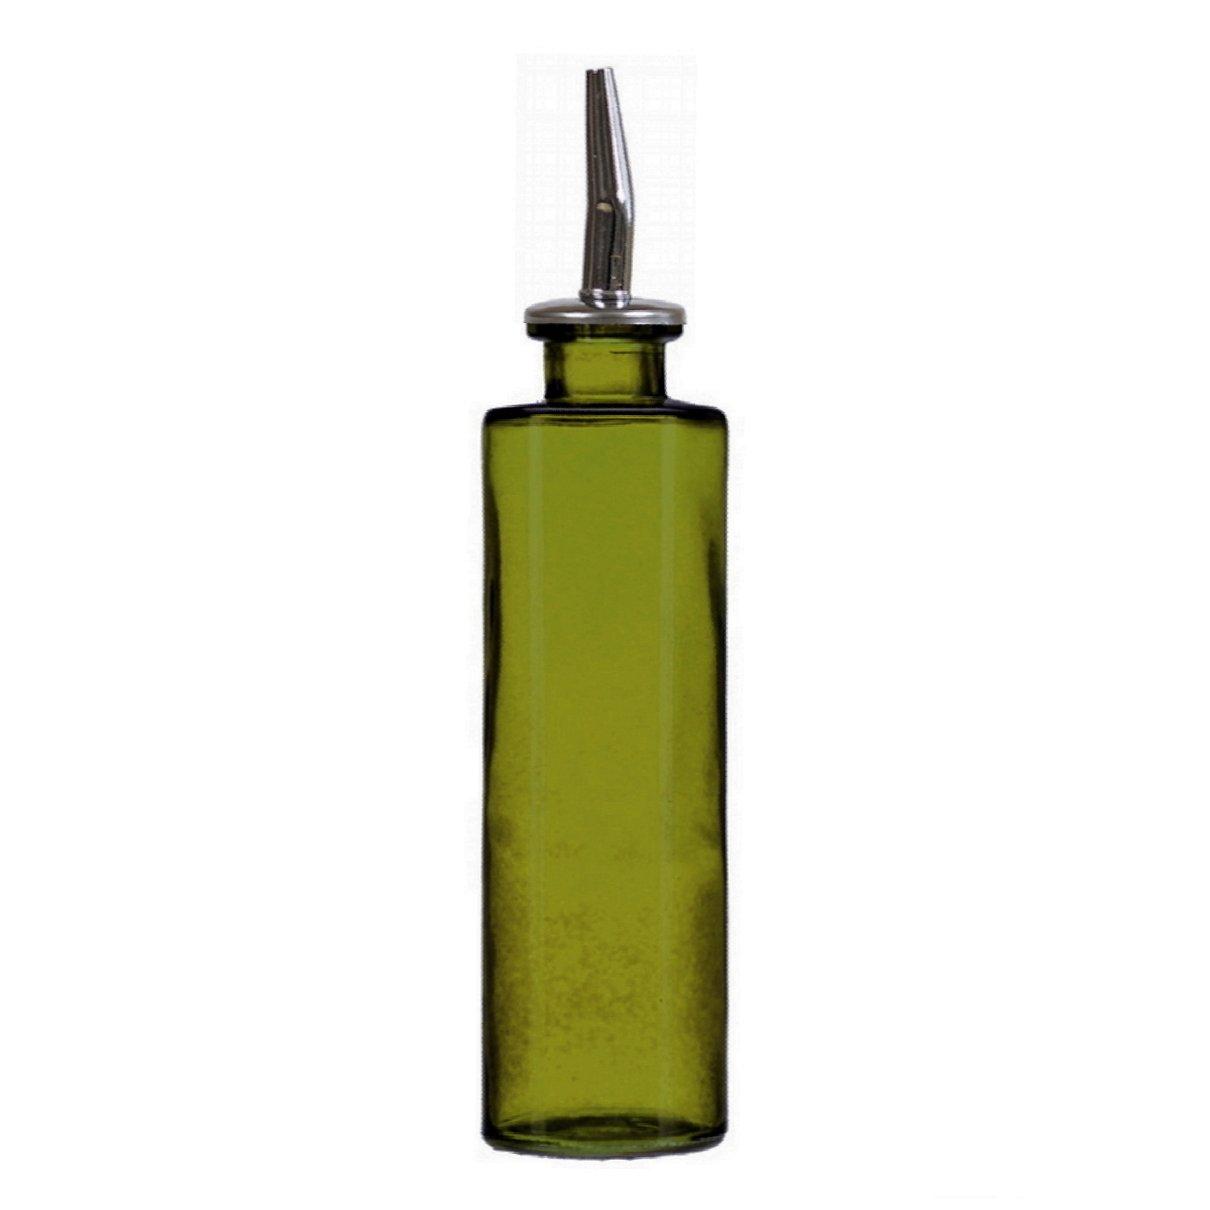 Attractive Amazon.com: Colorful Olive Oil Dispenser, Oil and Vinegar Dressing  HG34